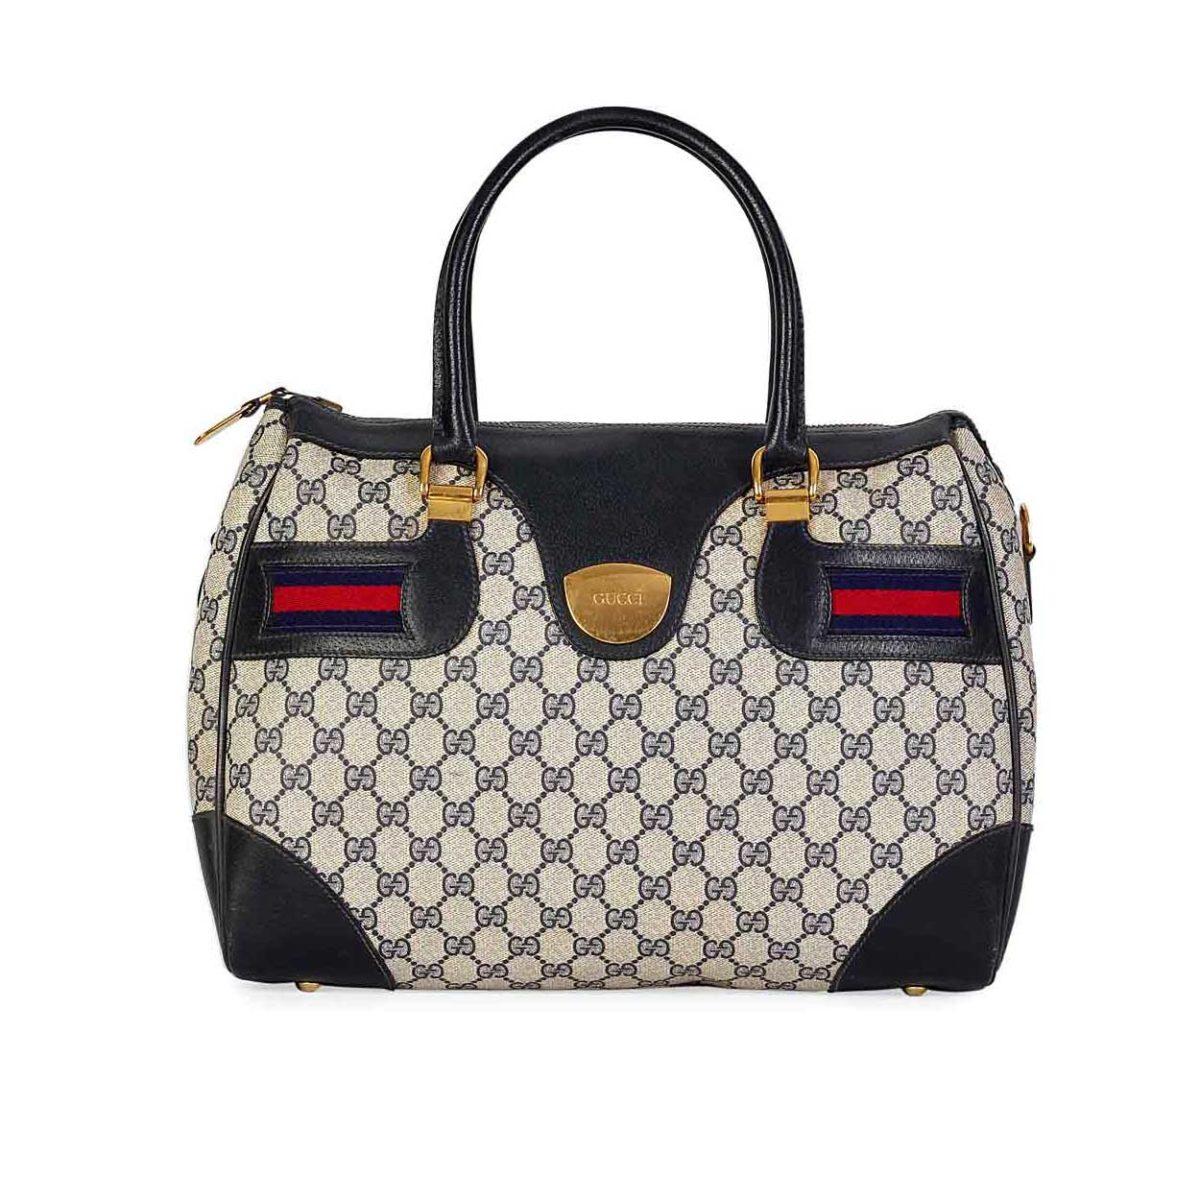 Gucci Handbags South Africa